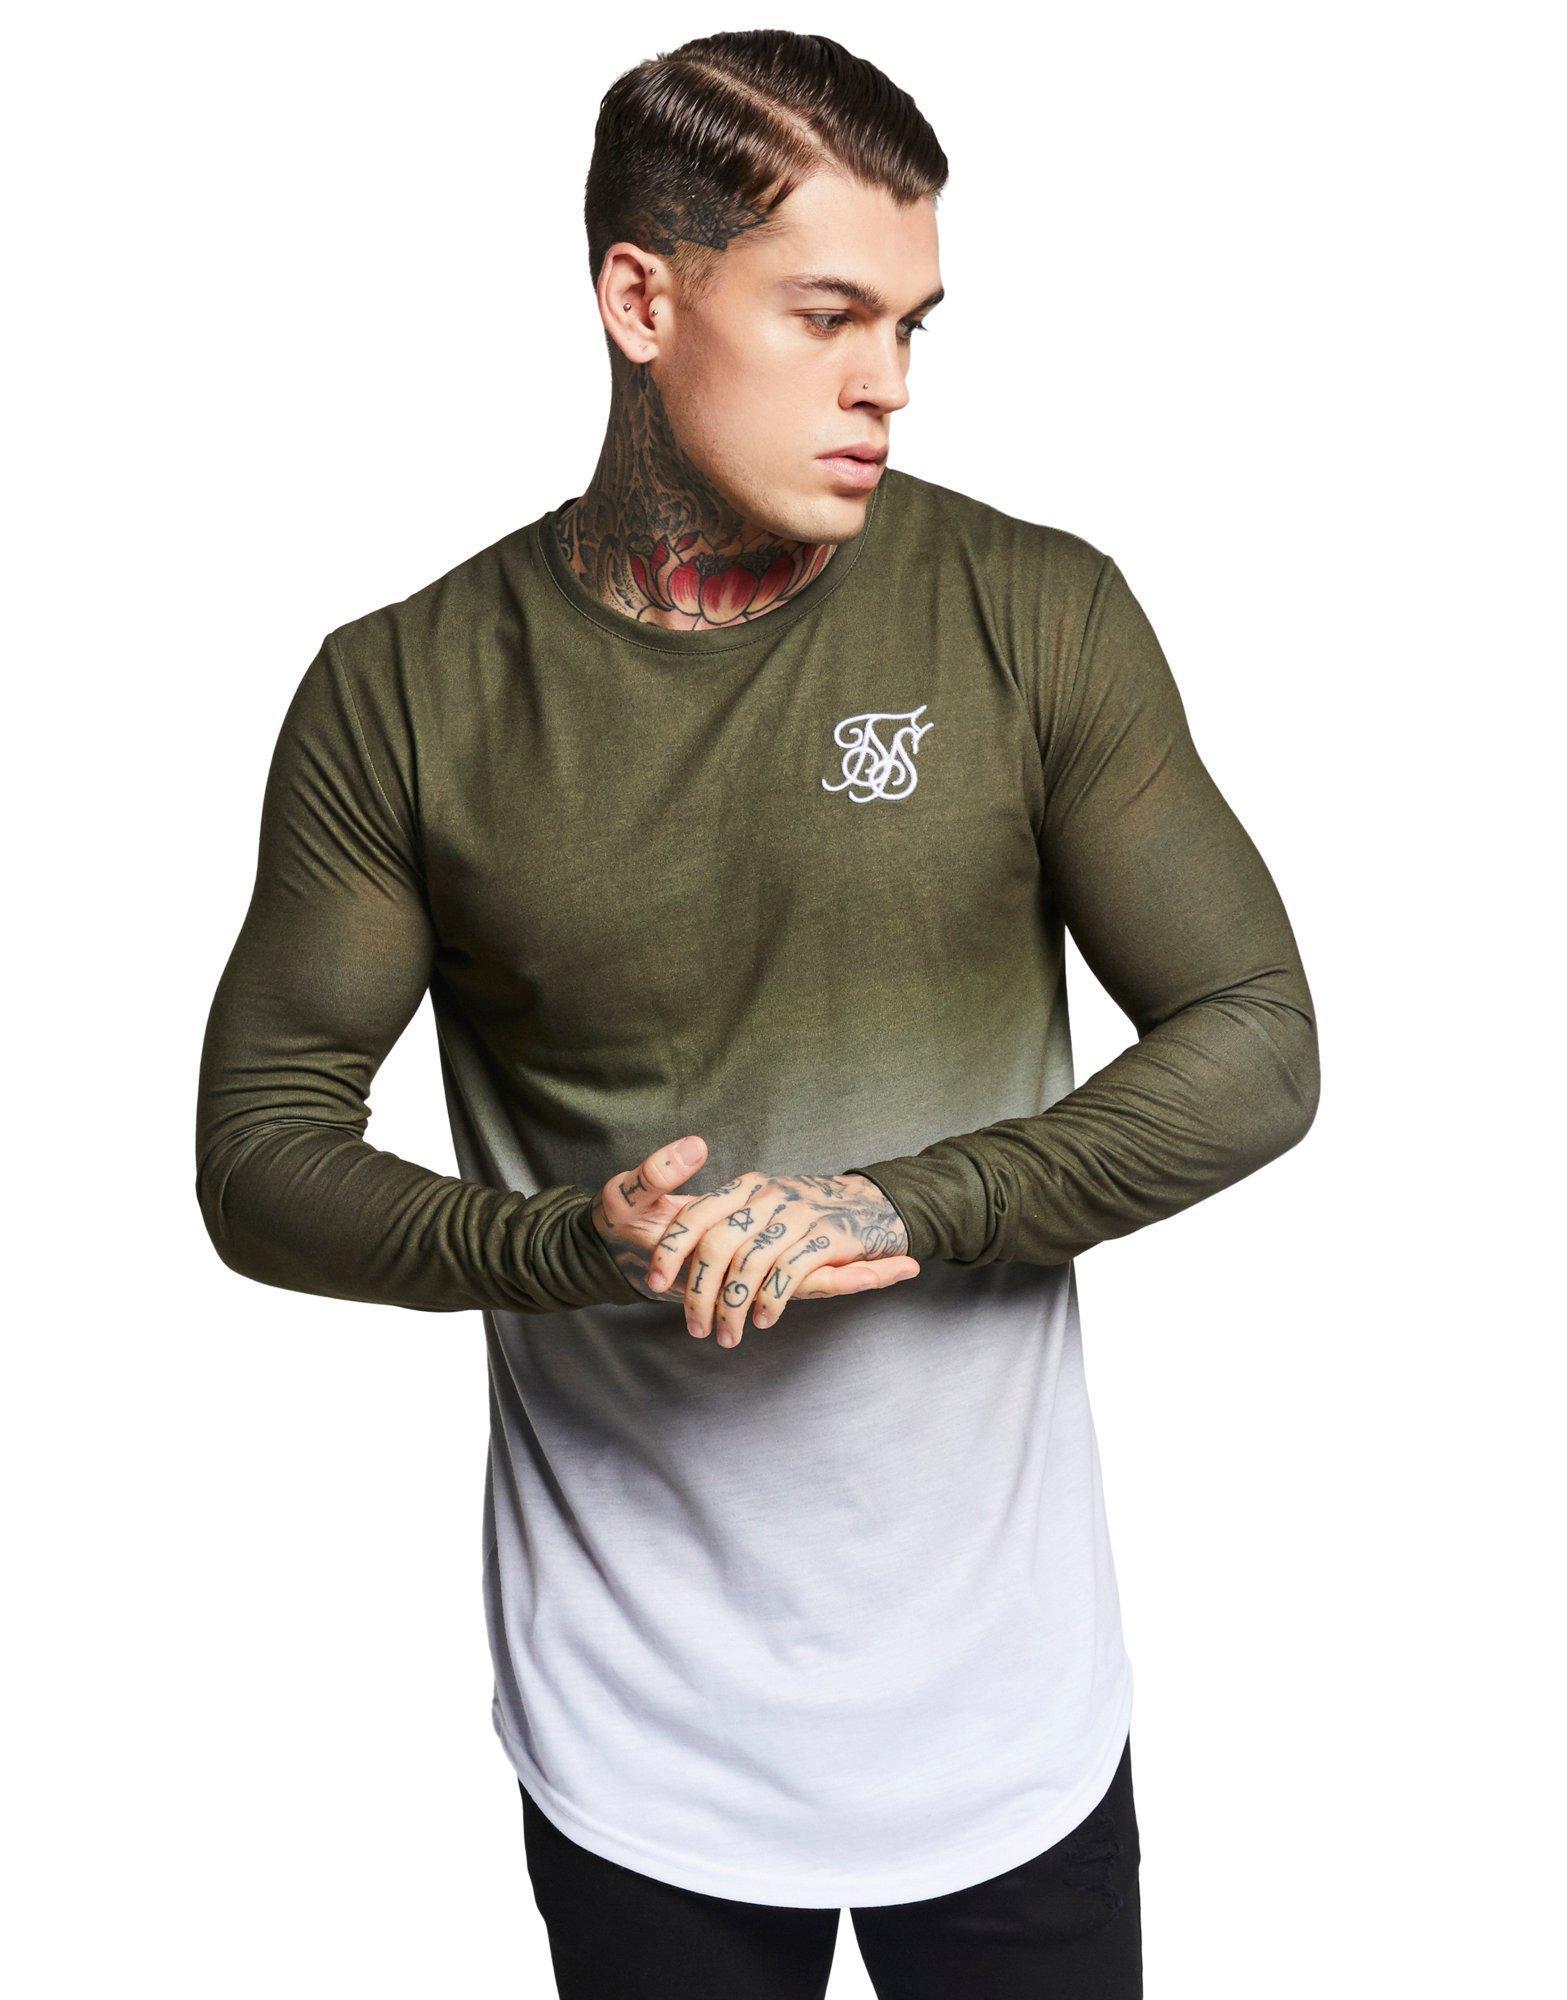 Vole La Lumiere Mens T-Shirt Vest Sik Designer Tape Gym Top Silk Shark Gold King